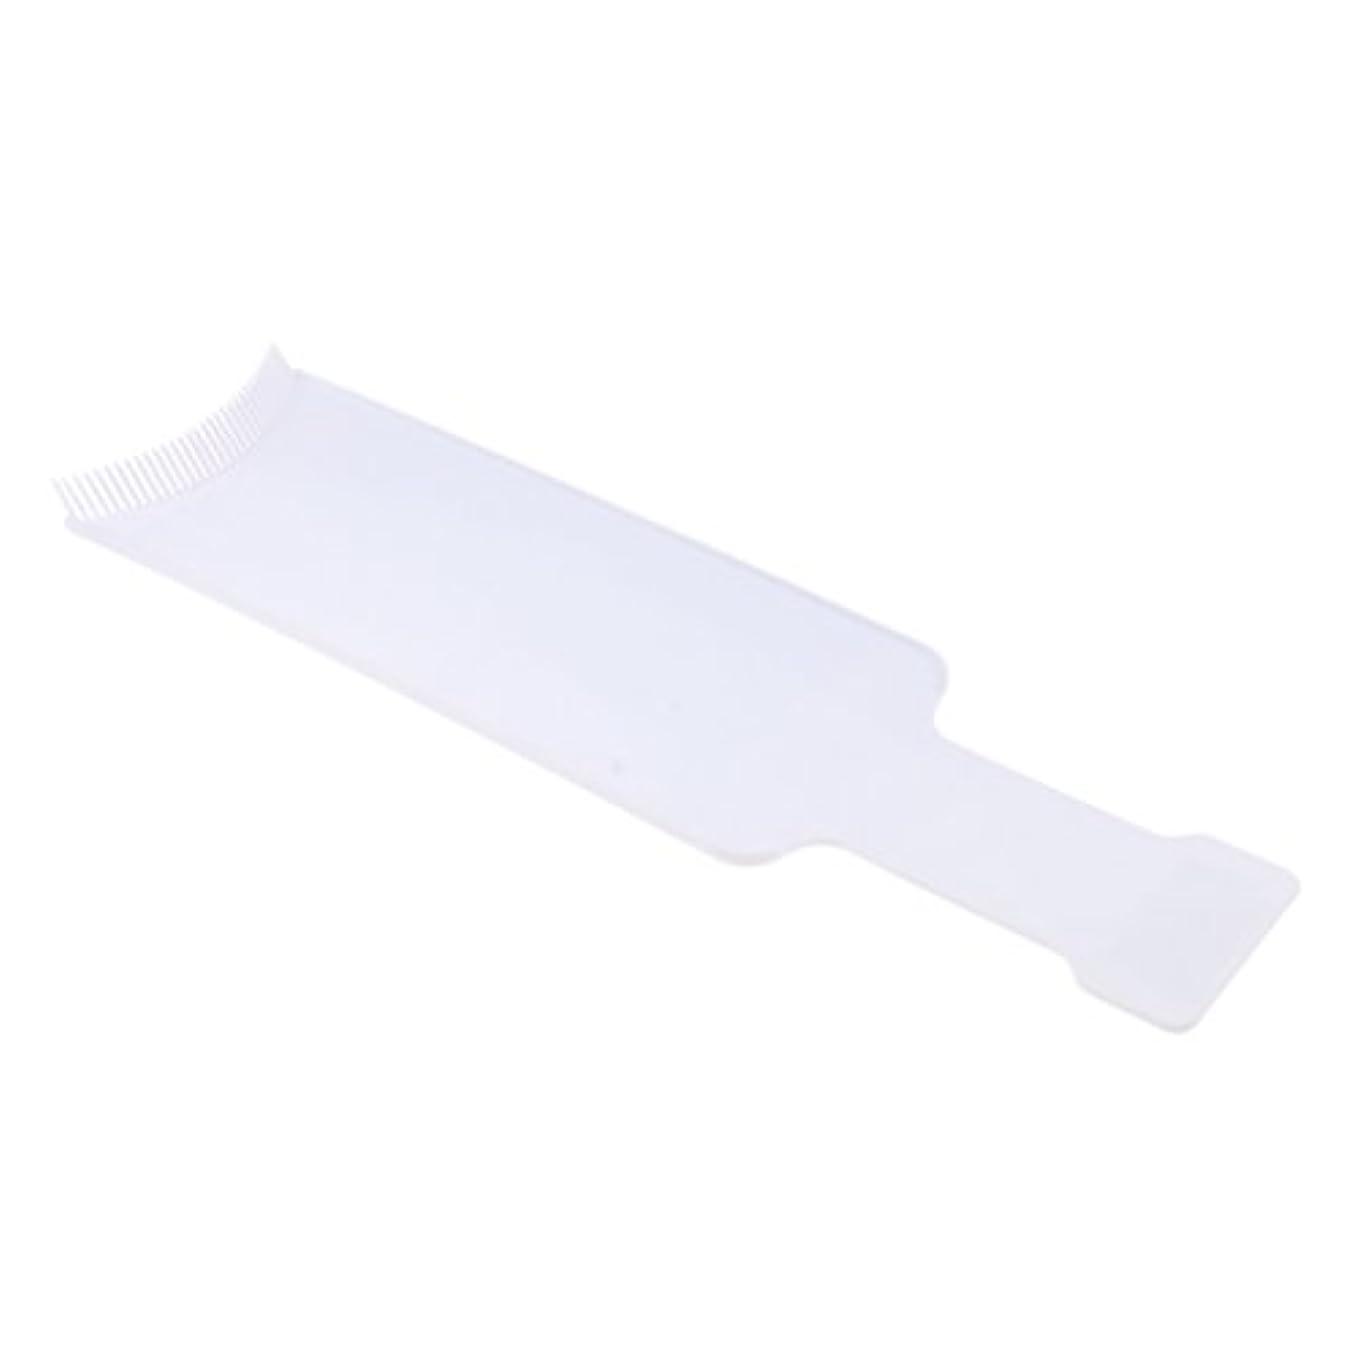 Fenteer 染色櫛プレート 染めボード ヘアカラー 櫛 着色ボード ヘアブラシ ヘアコーム 便利 2サイズ2色選べる - L, 白